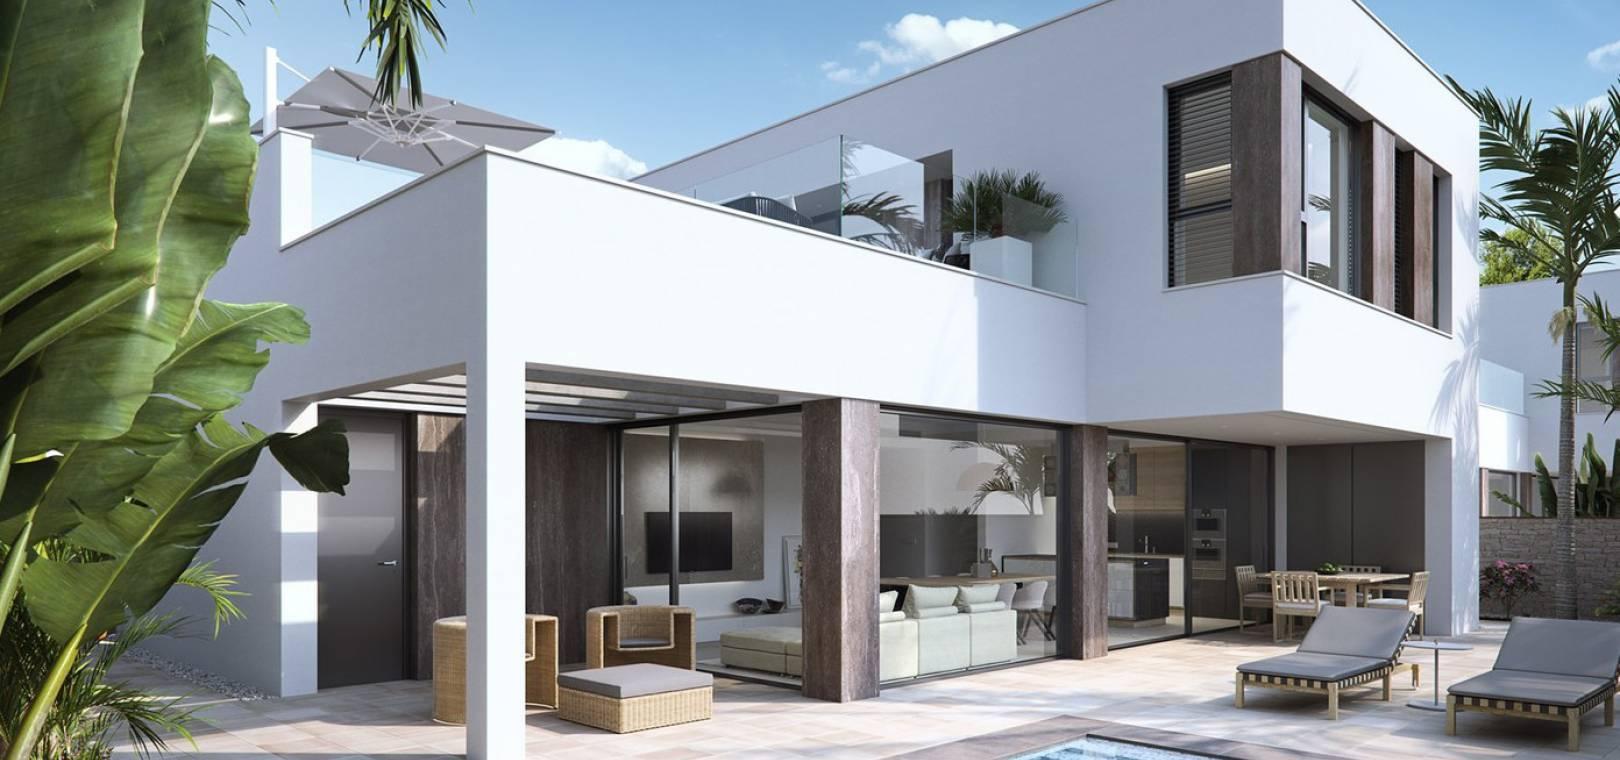 Torre_de_la_Horadada_New_Build_Luxury_Houses_For_Sale_nsp256_22